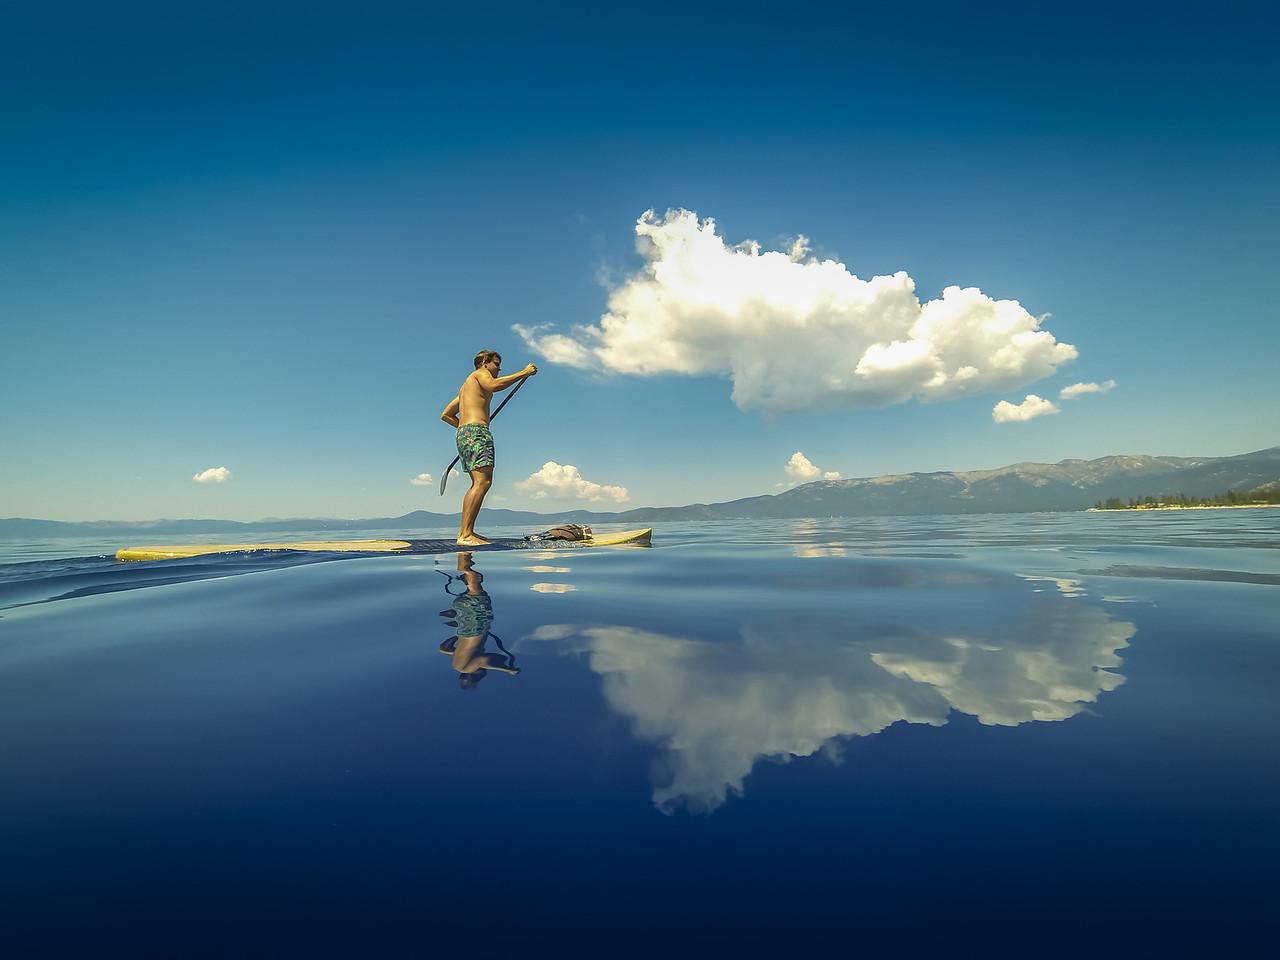 Man stand up paddle boarding near Sand Harbor, Nevada, Lake Tahoe